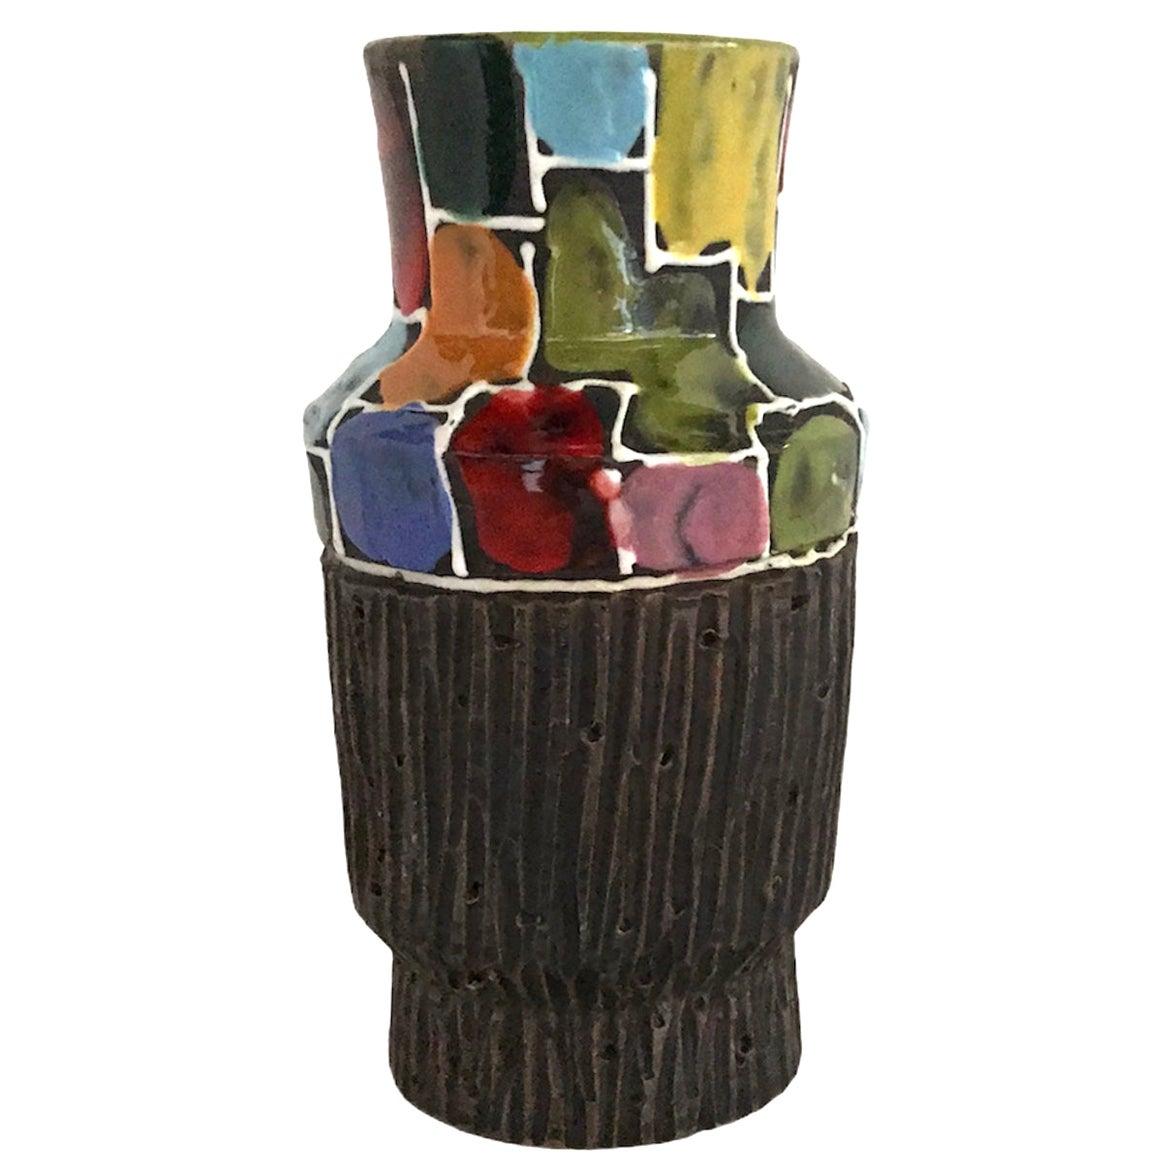 Modern Italian Ceramic Vase by Fratelli Fanciullacci Bitossi, 1960s